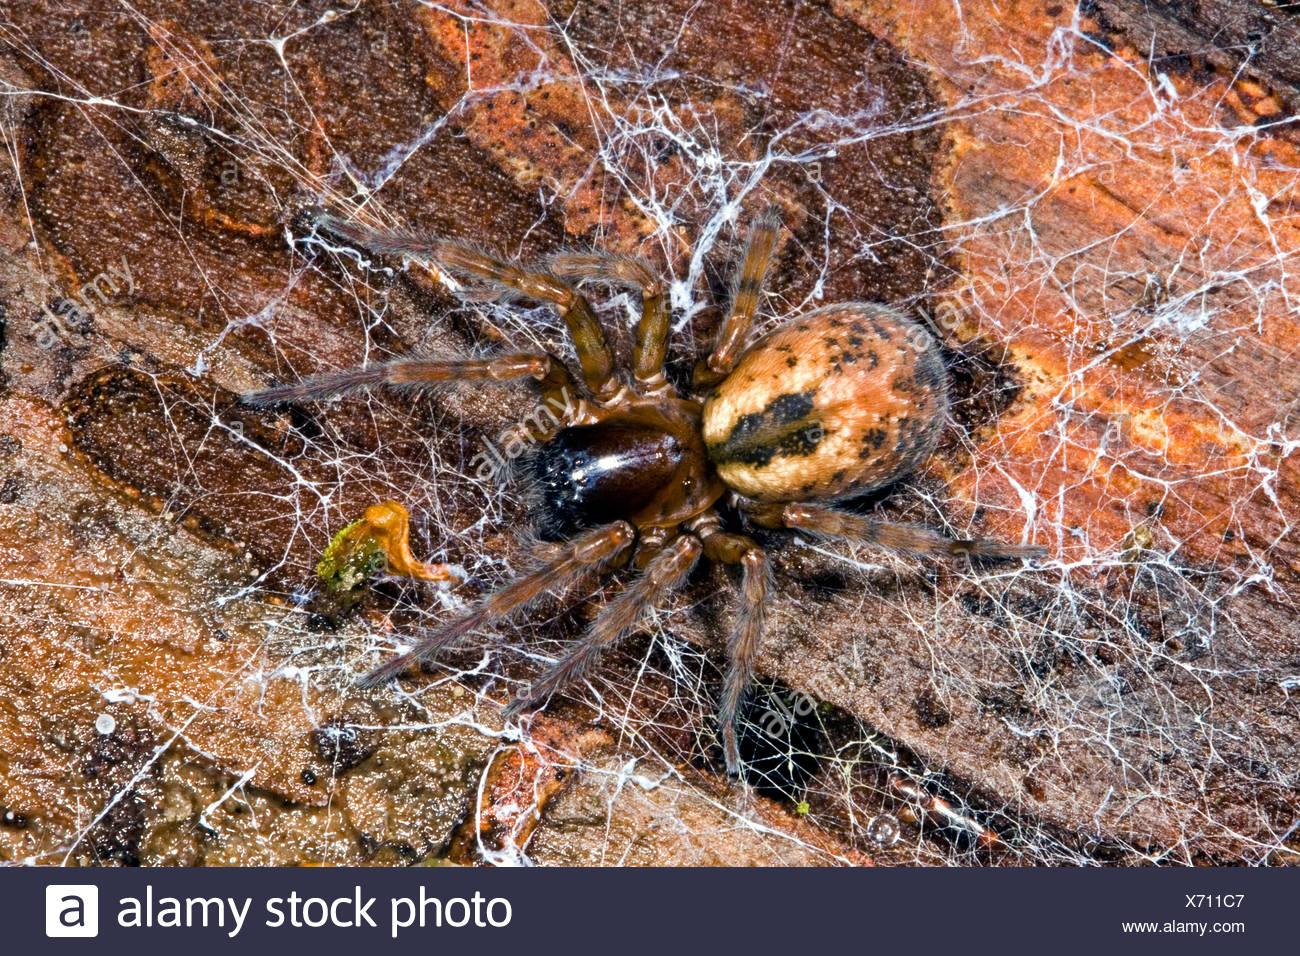 white-eyed spider (Amaurobiidae), from above - Stock Image